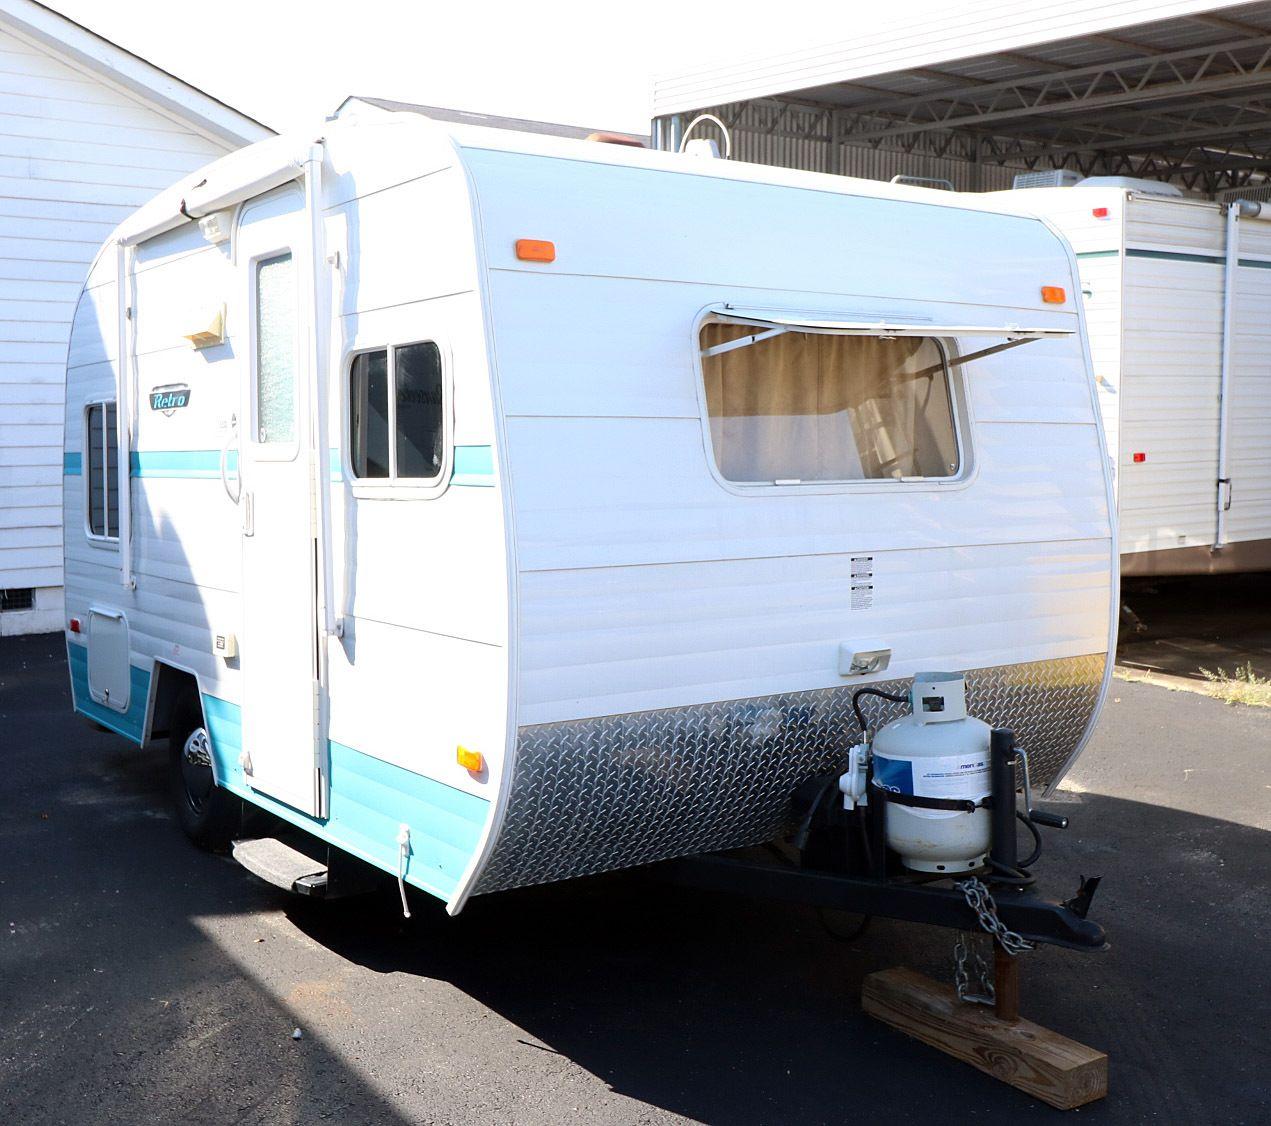 2015 Retro 155xl Montgomery Al Rvtrader Com Rvs For Sale Recreational Vehicles Rv Trader